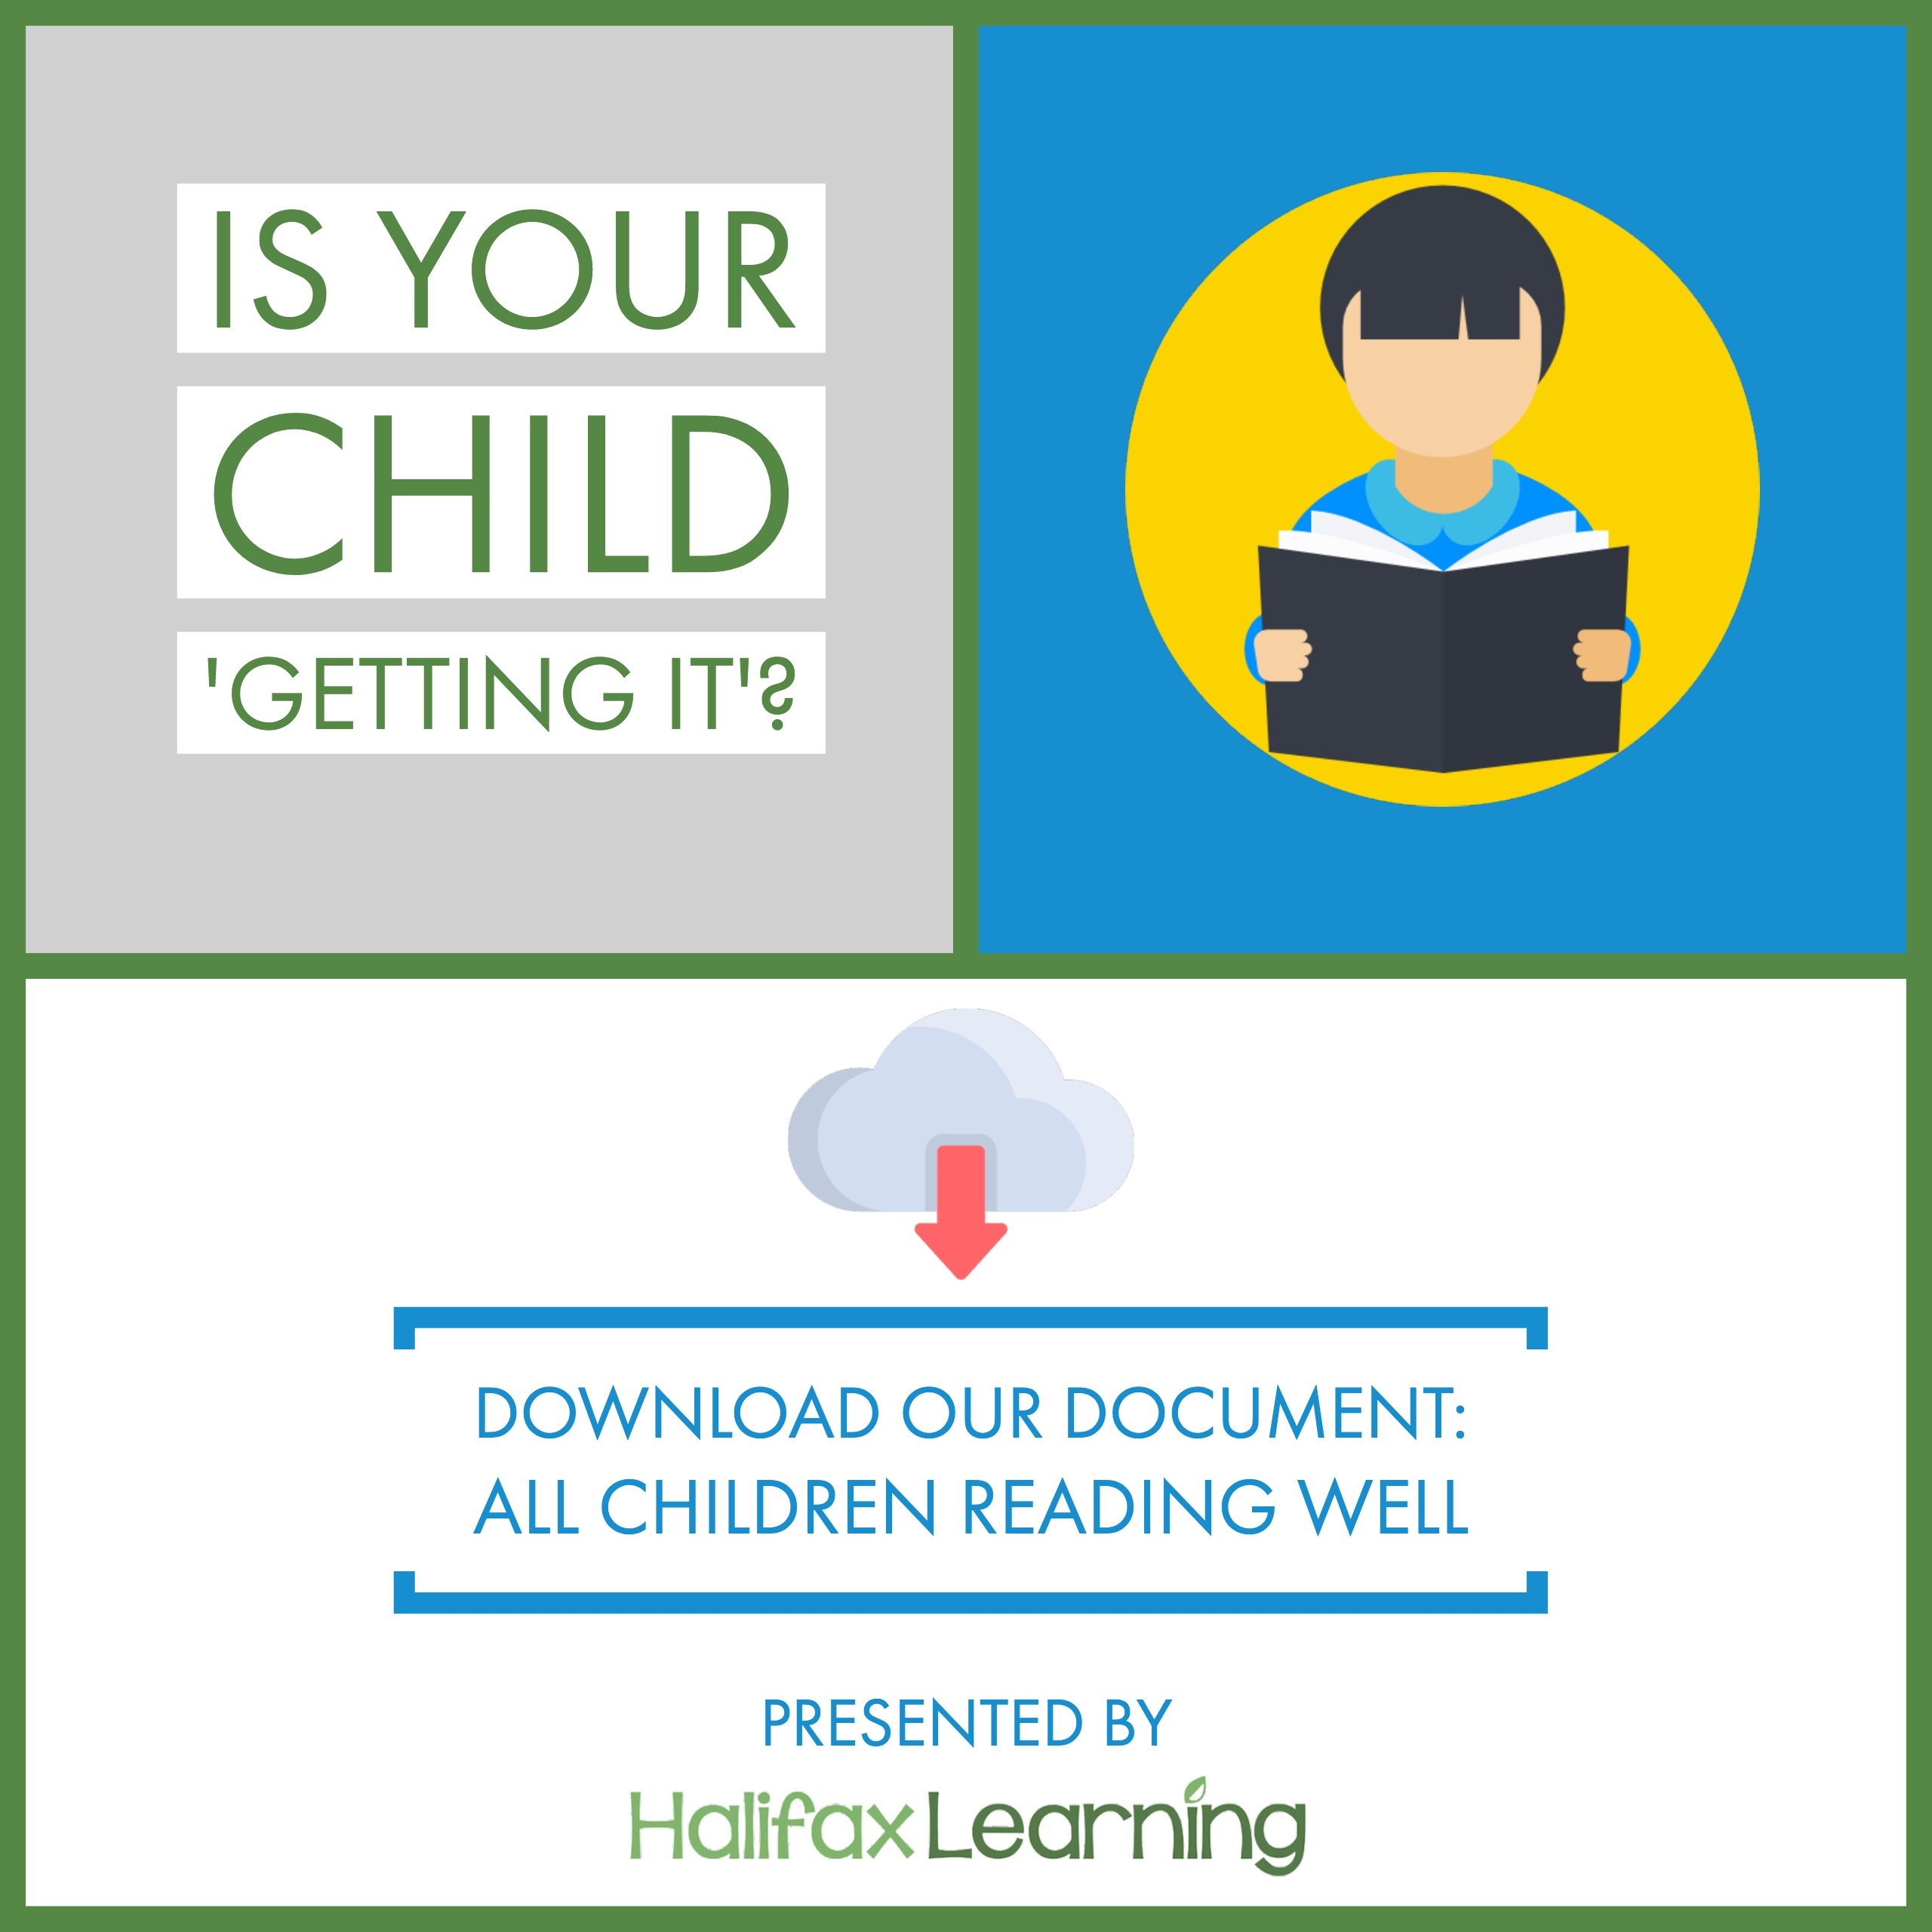 halifax learning morphology reading program reading support literacy tutor tutoring read write spell education evidence-based